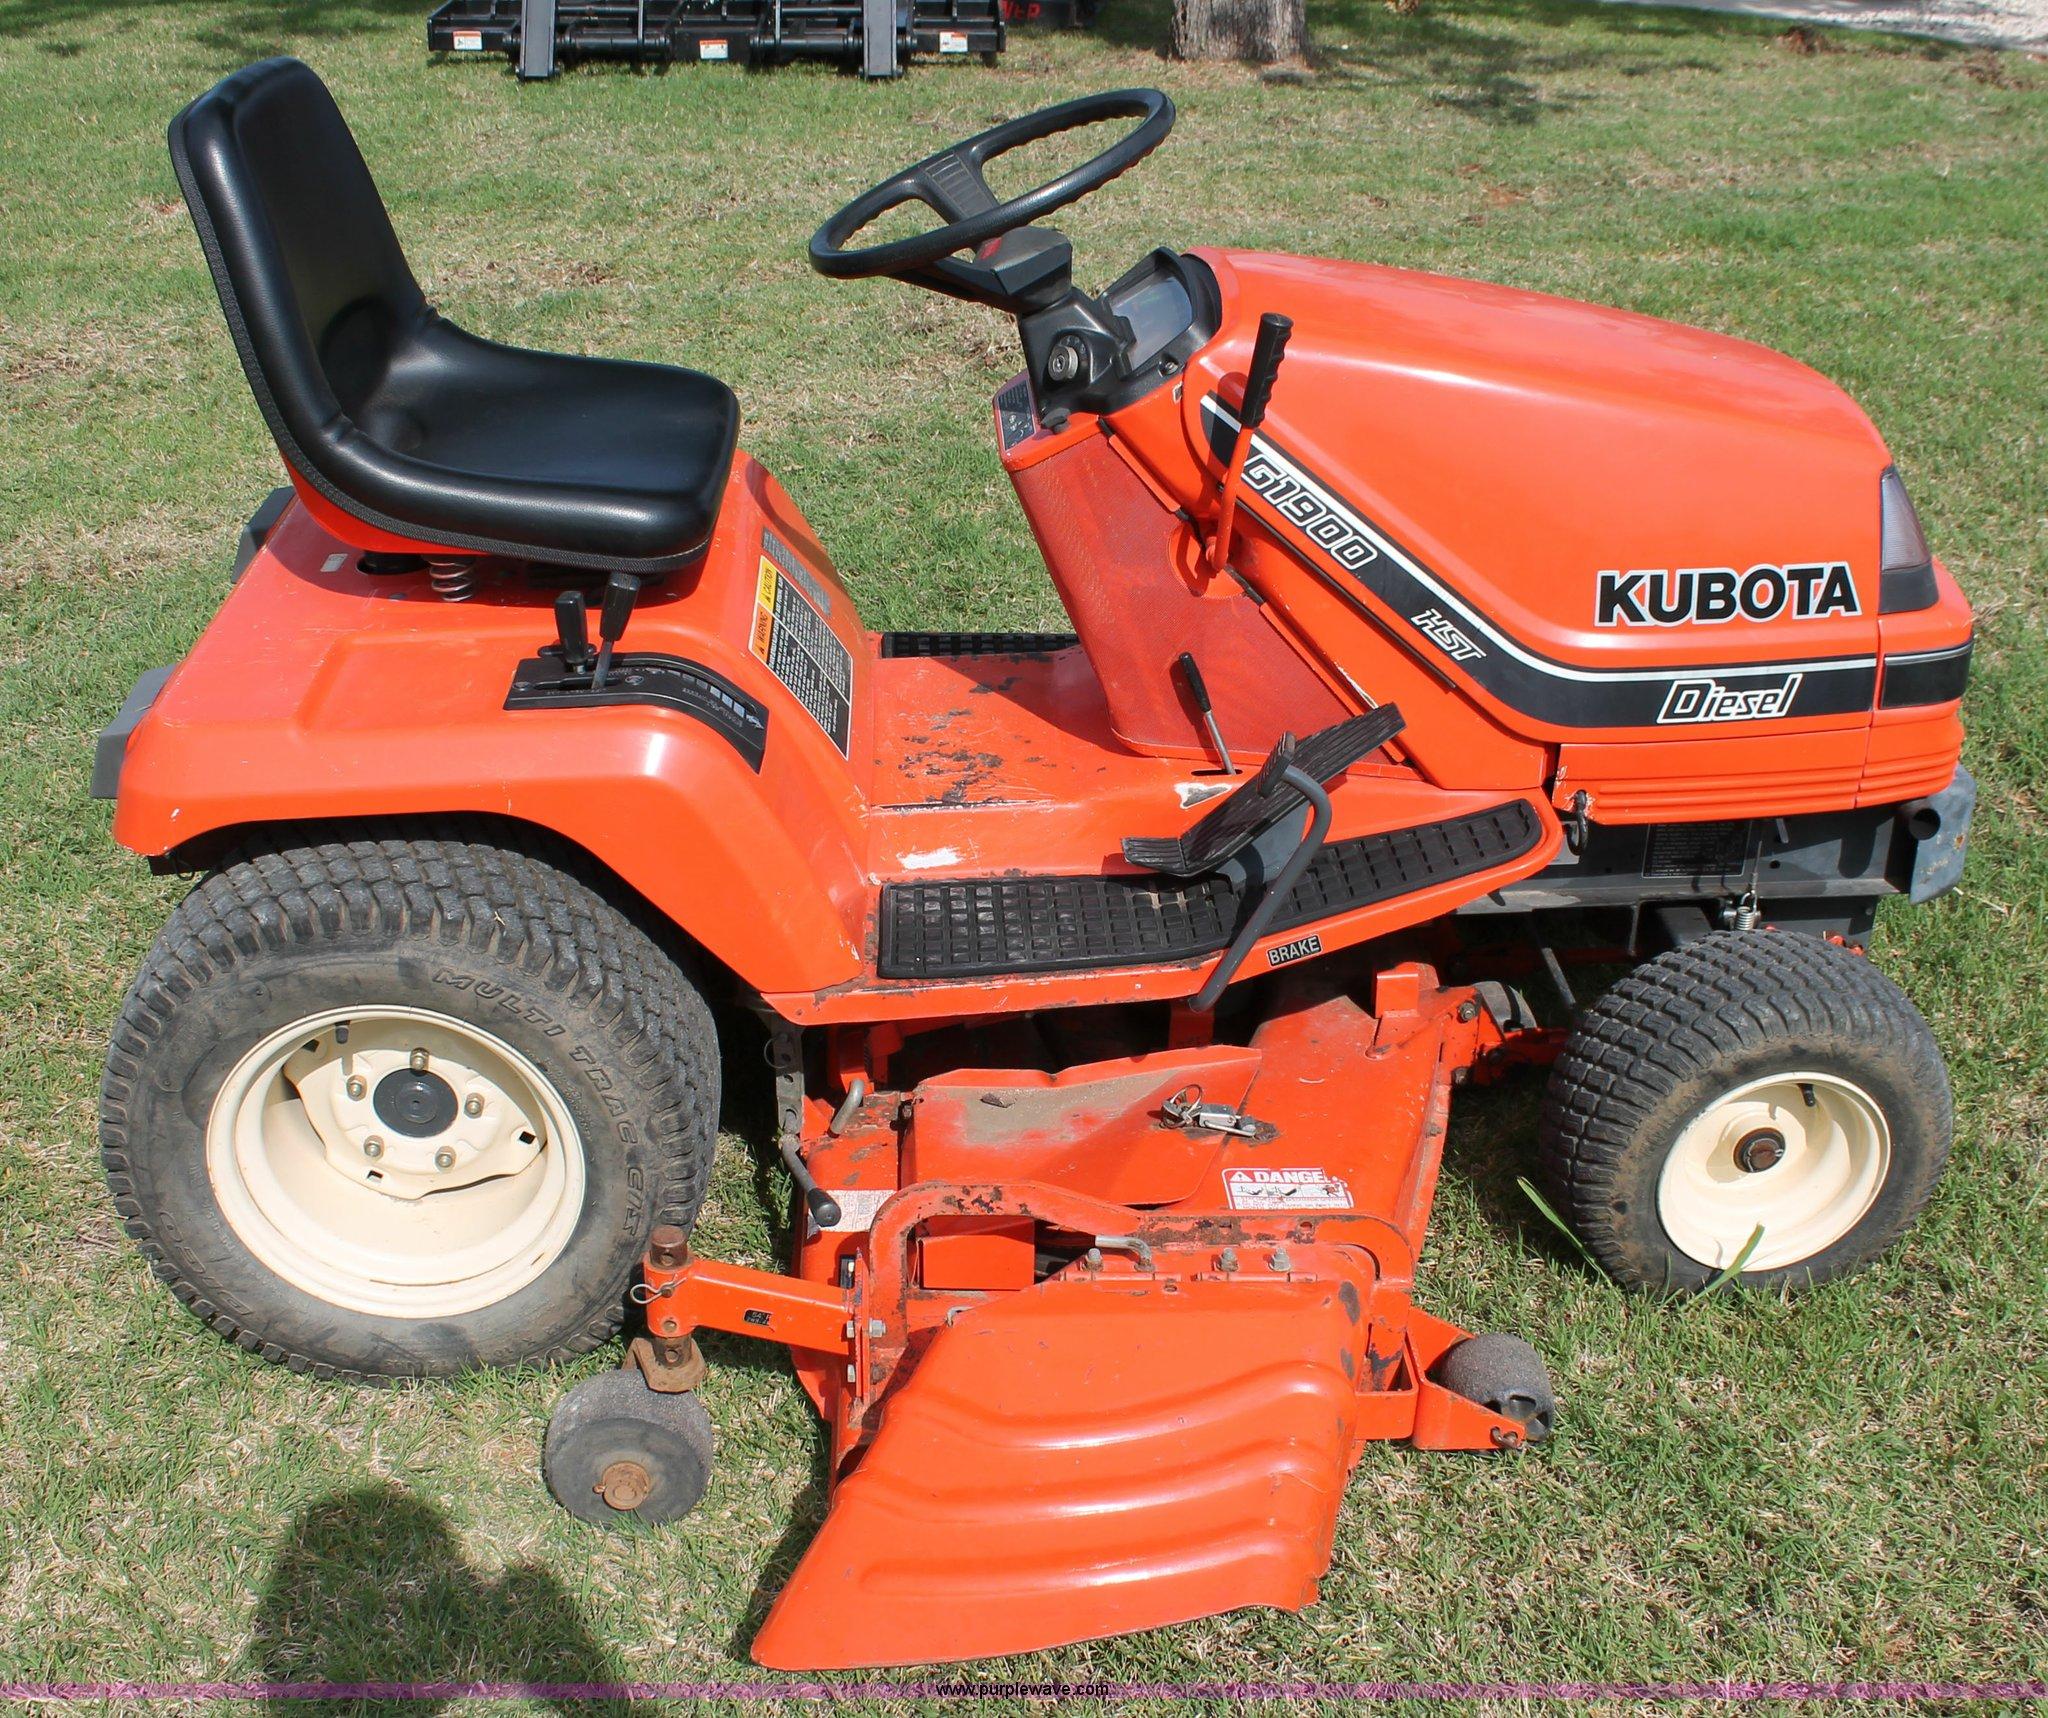 ... Kubota G1900 lawn mower Full size in new window ...